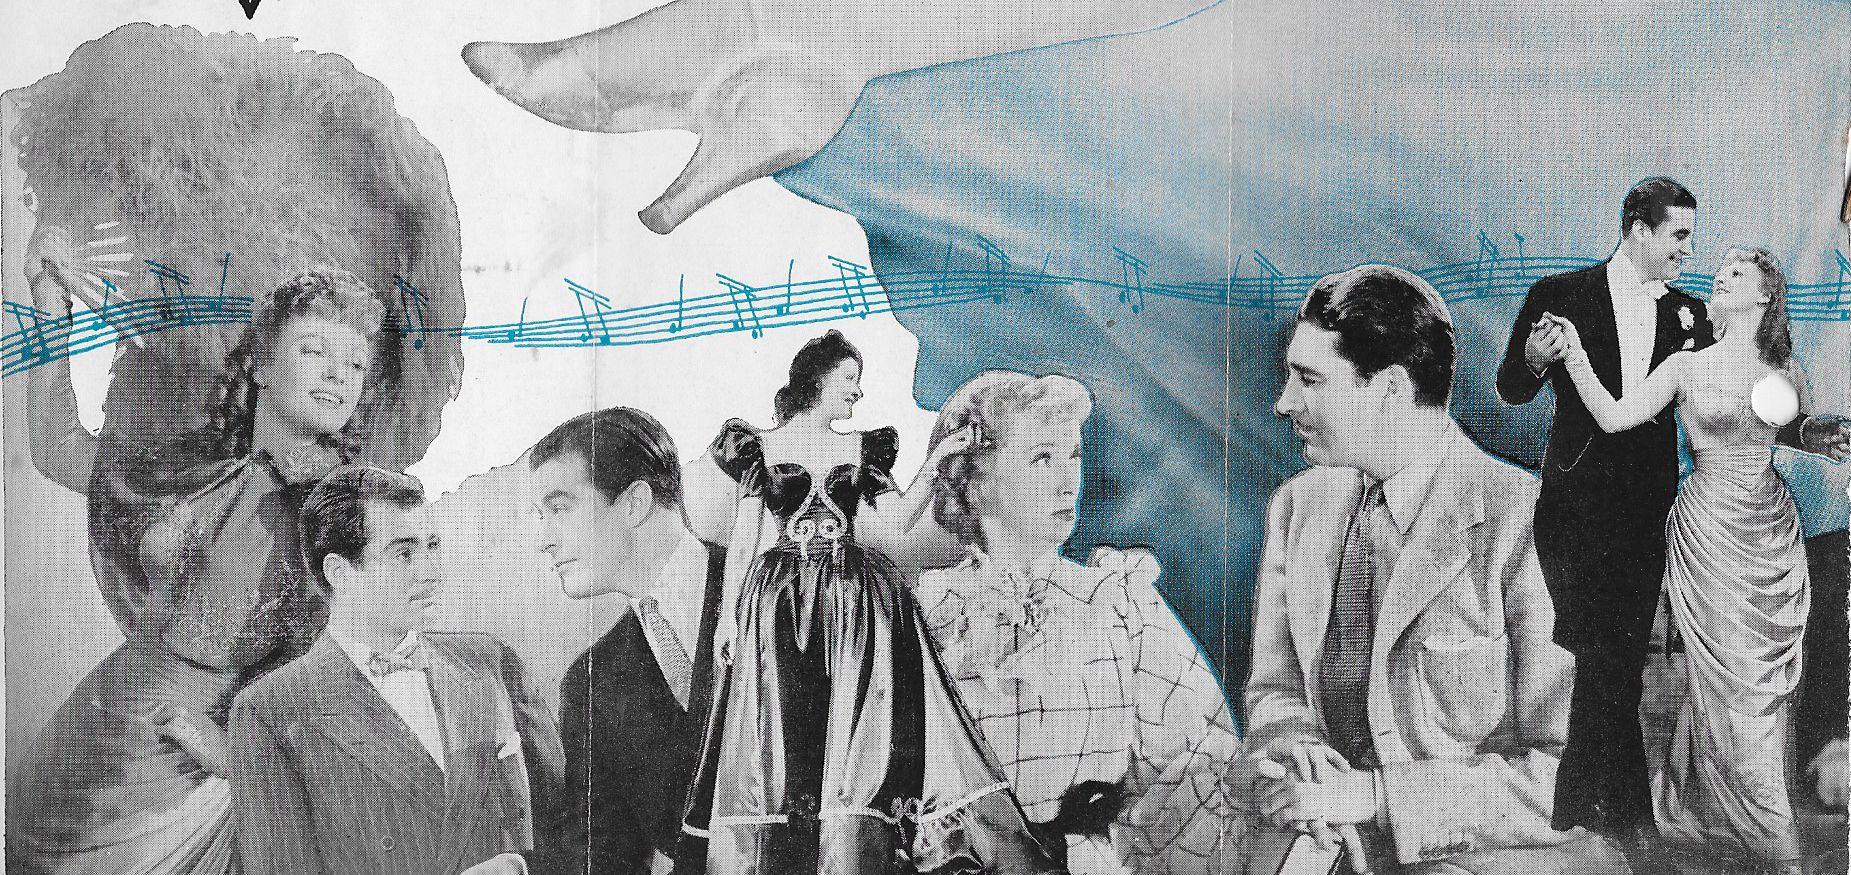 Billie Burke, Ray Milland, Alan Marshal, and Anna Neagle in Irene (1940)